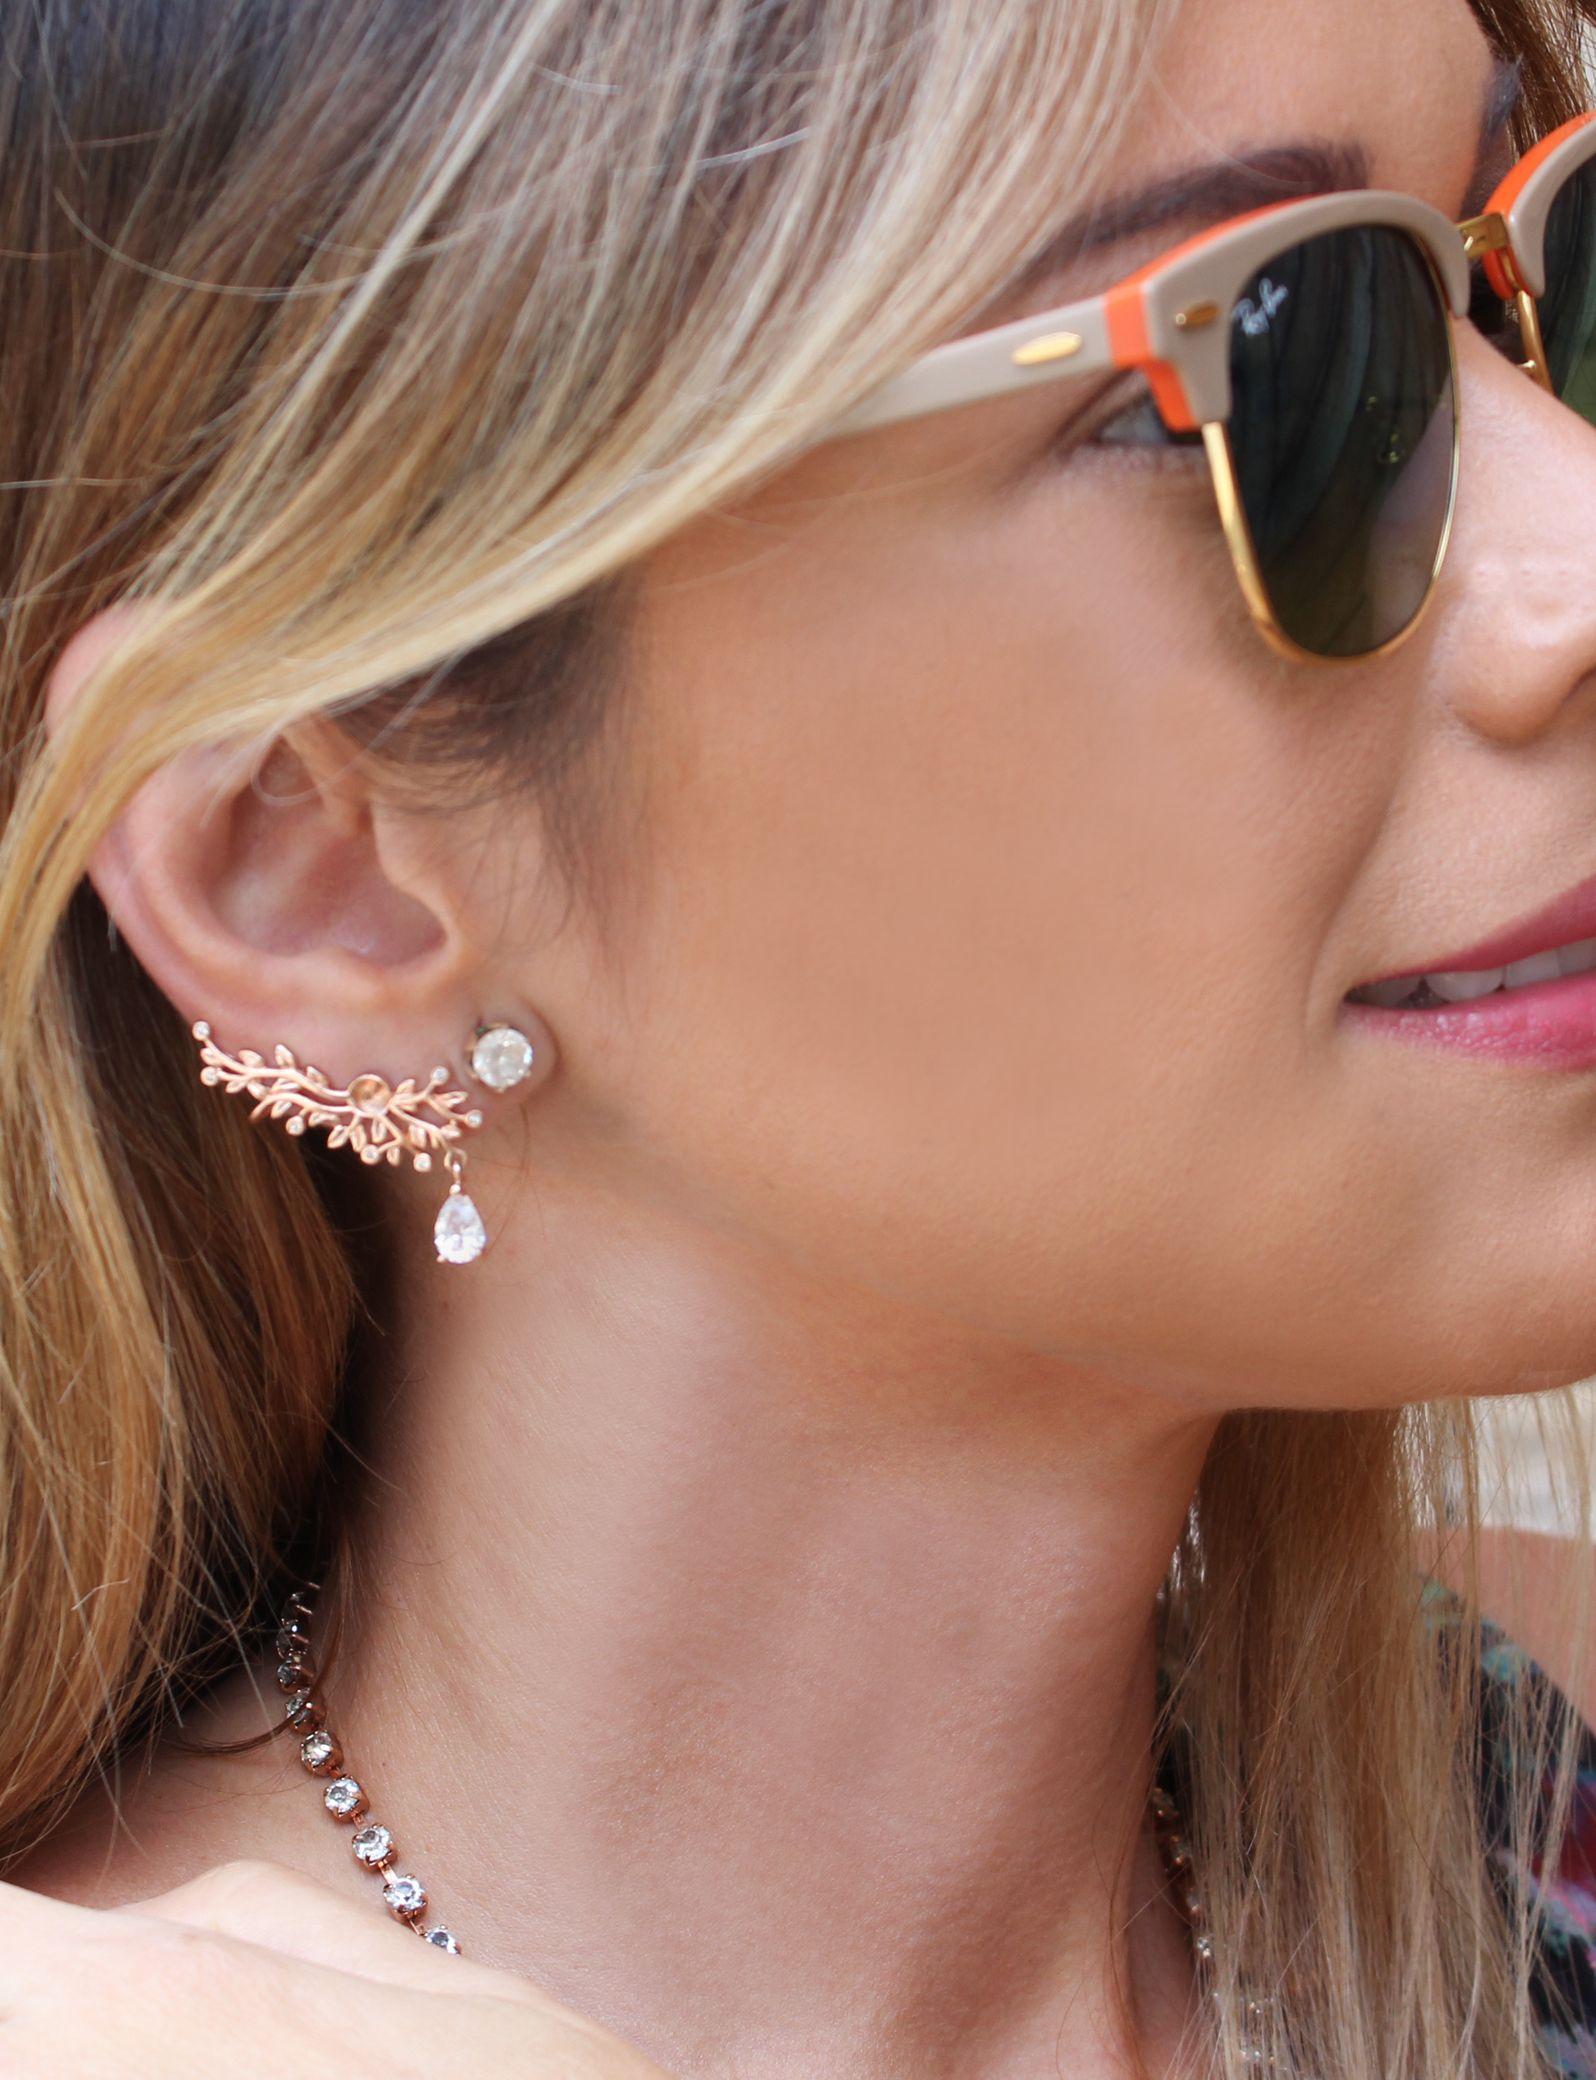 ear-cuff   Accessories&parfume   Pinterest